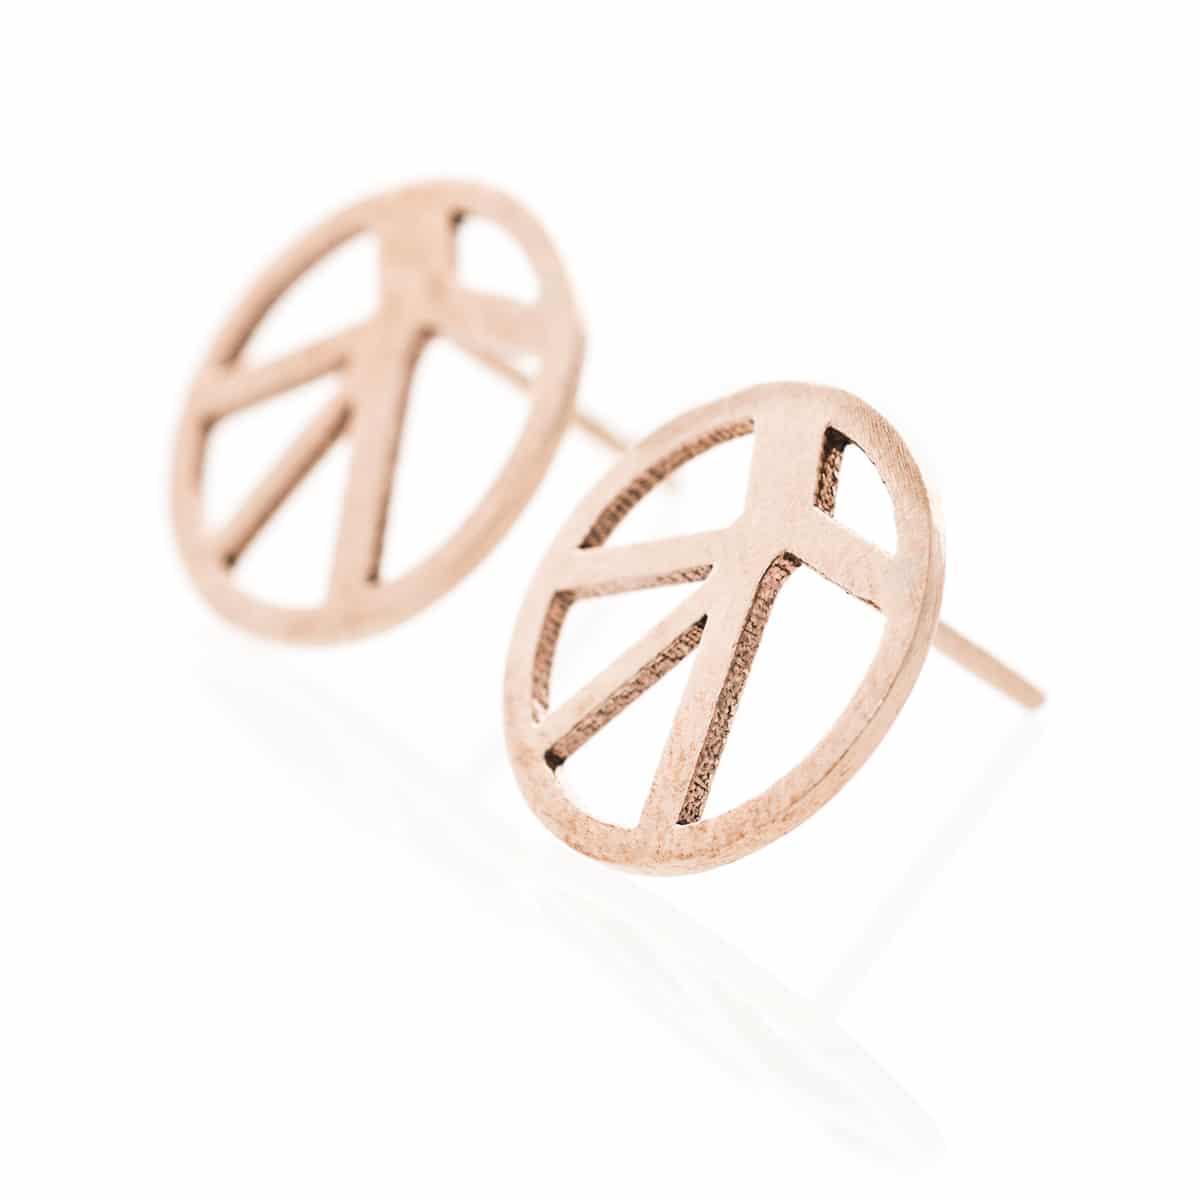 Voronoii-earrings-raw-bronze-1